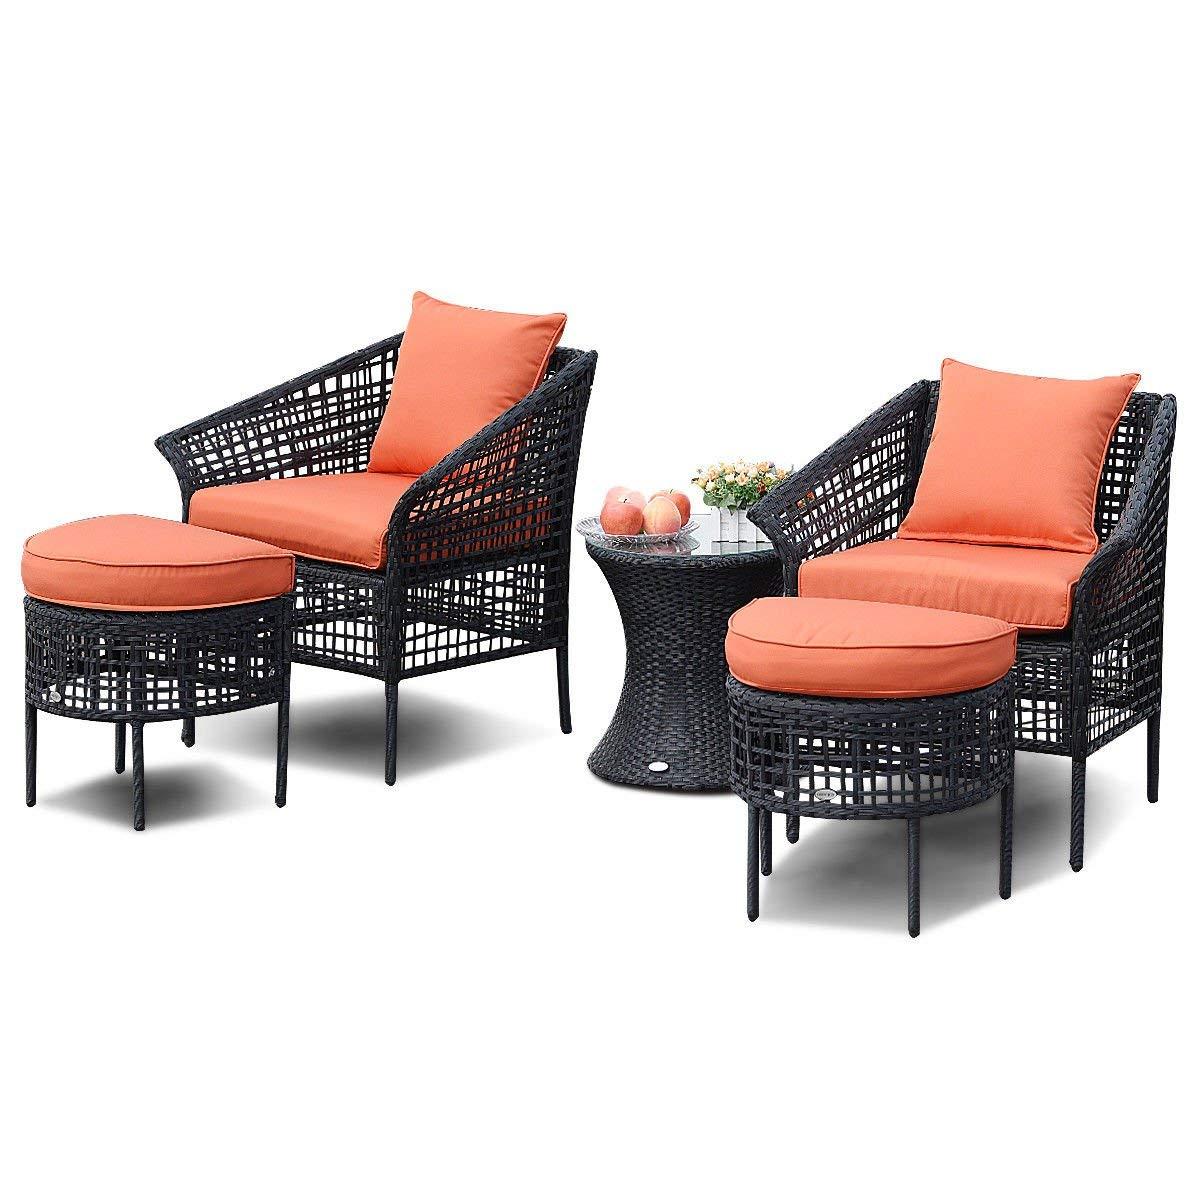 Outdoor 5pcs Pe Rattan Furniture Set 2 Ottomans Single Sofas 1 Tempered Gl Coffee Tea